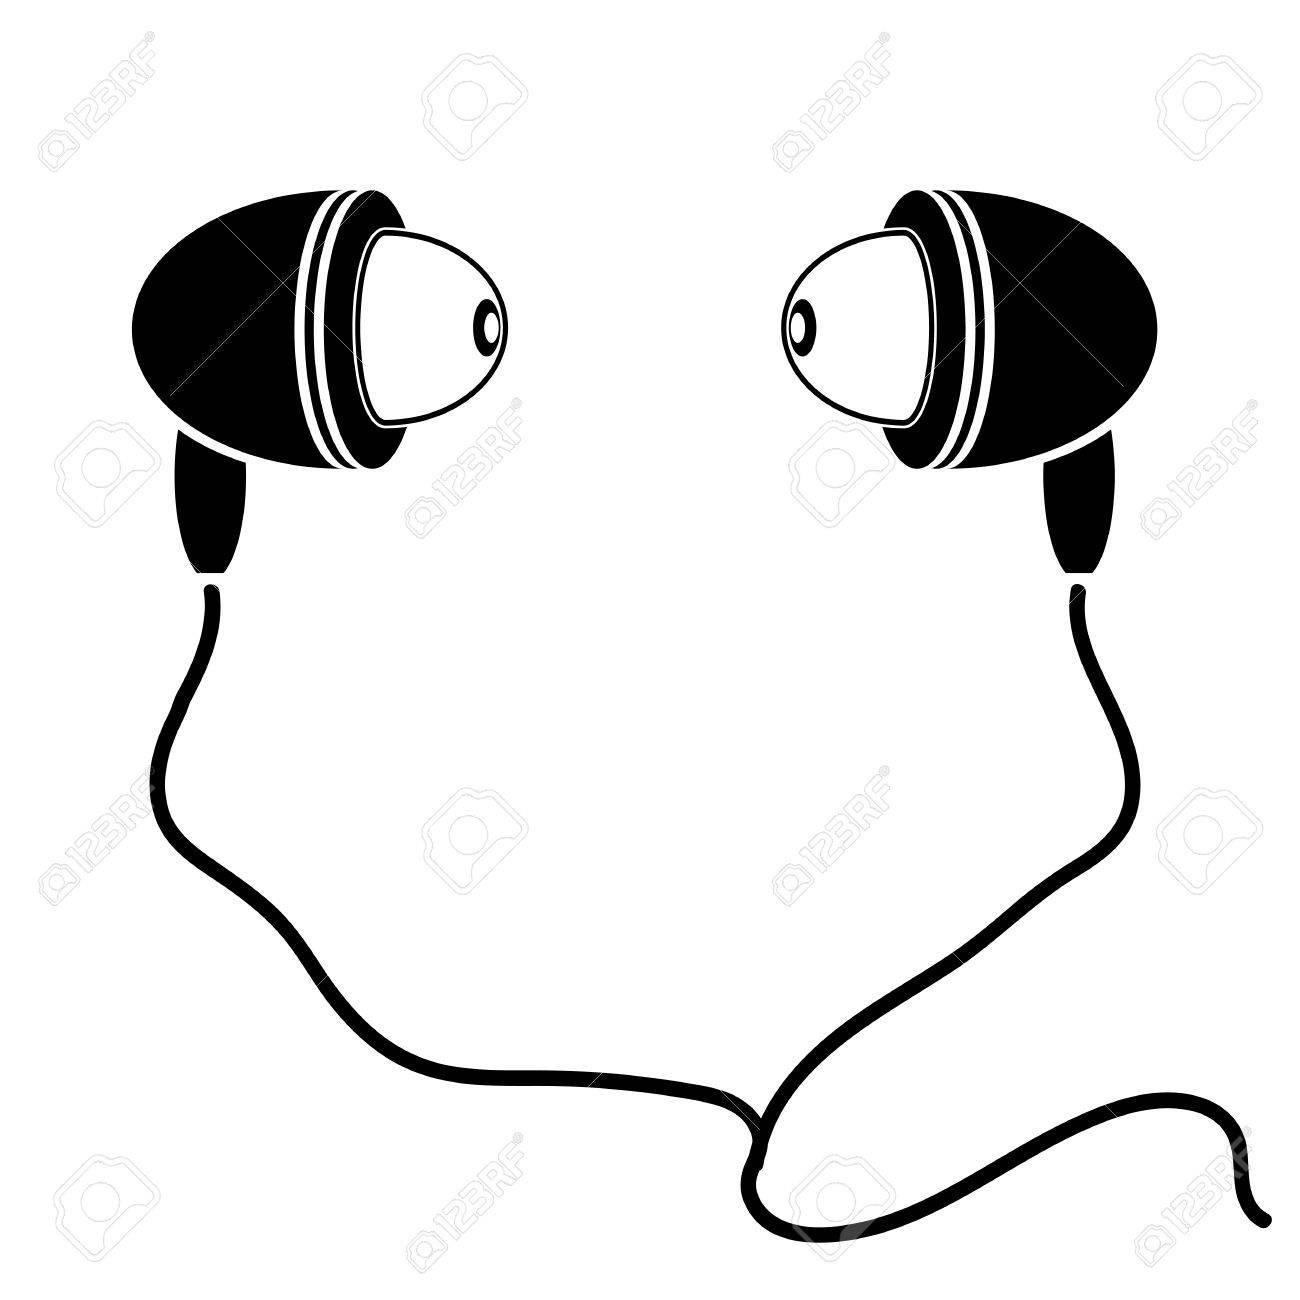 1300x1300 Earphones Silhouette Isolated On White Background. Earphone Symbol